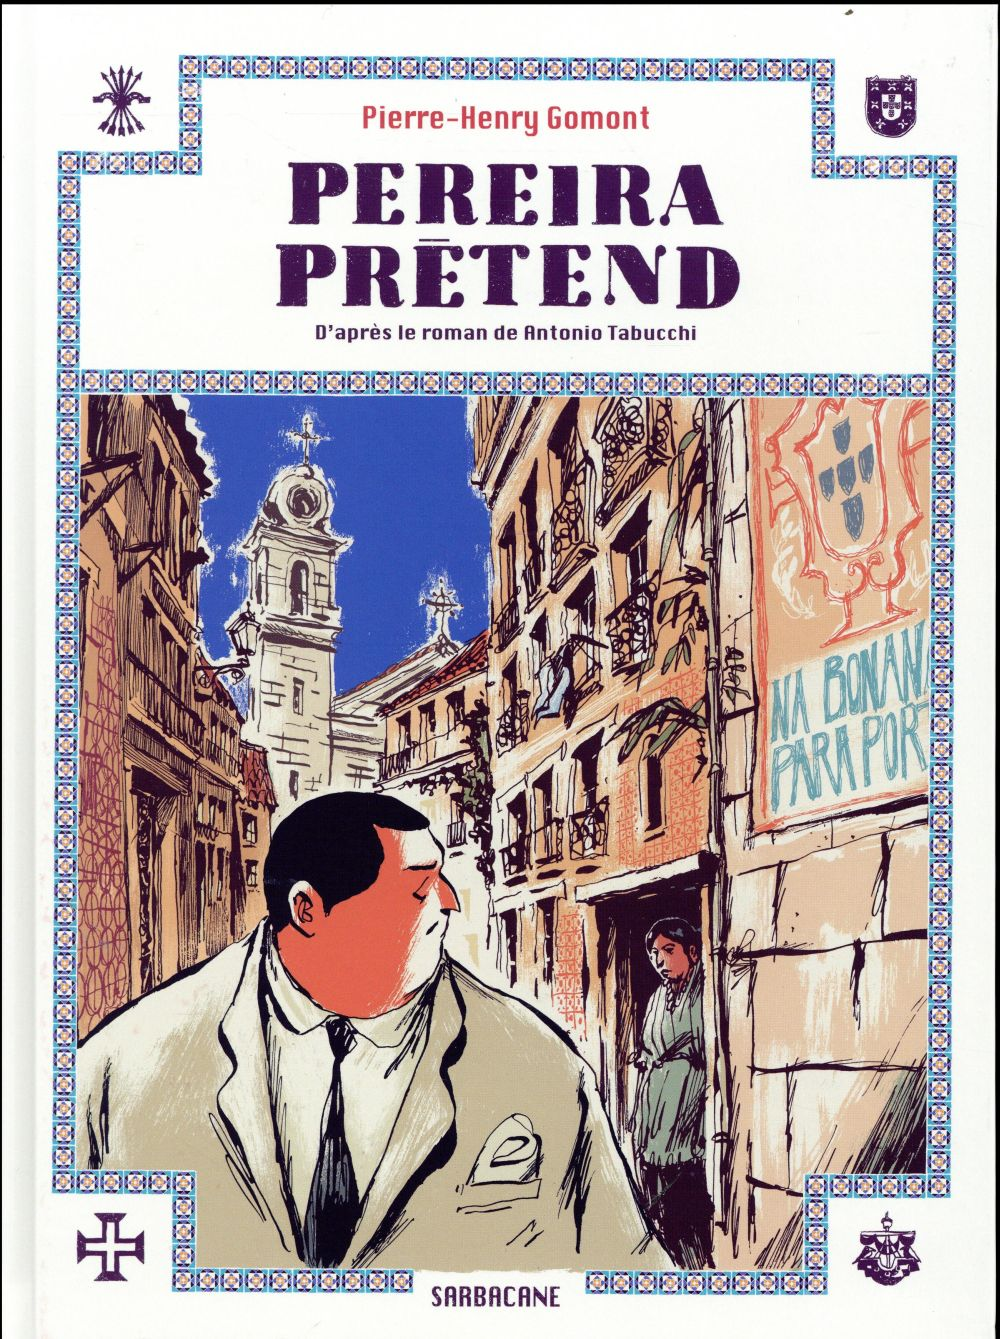 PEREIRA PRETEND - D'APRES LE ROMAN DE ANTONIO TABUCCHI